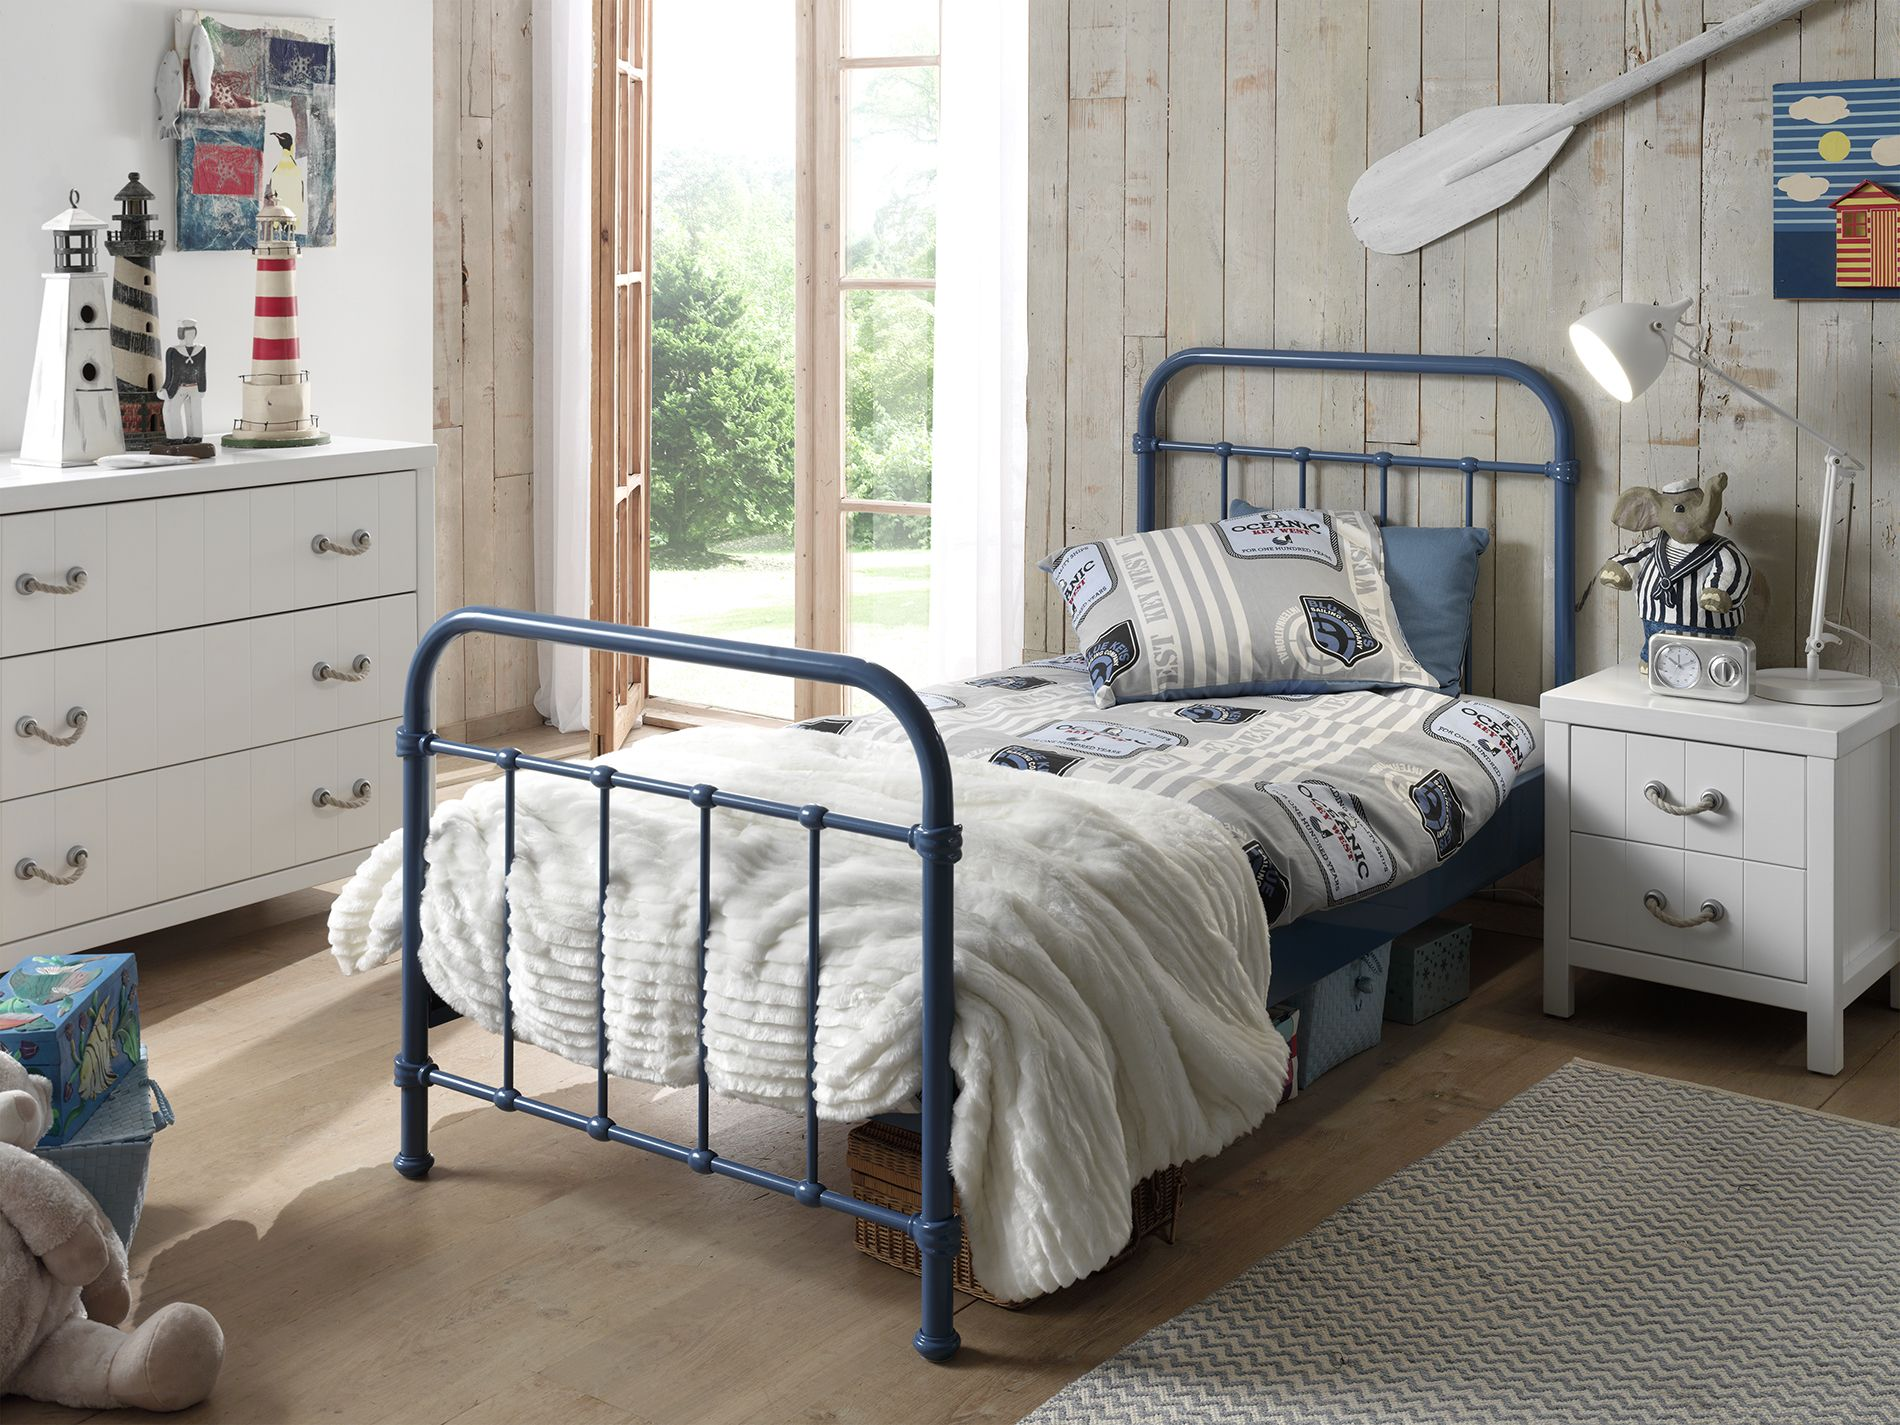 Full Size of Kinderbett New York Blau Emob Coole T Shirt Sprüche Betten T Shirt Wohnzimmer Coole Kinderbetten